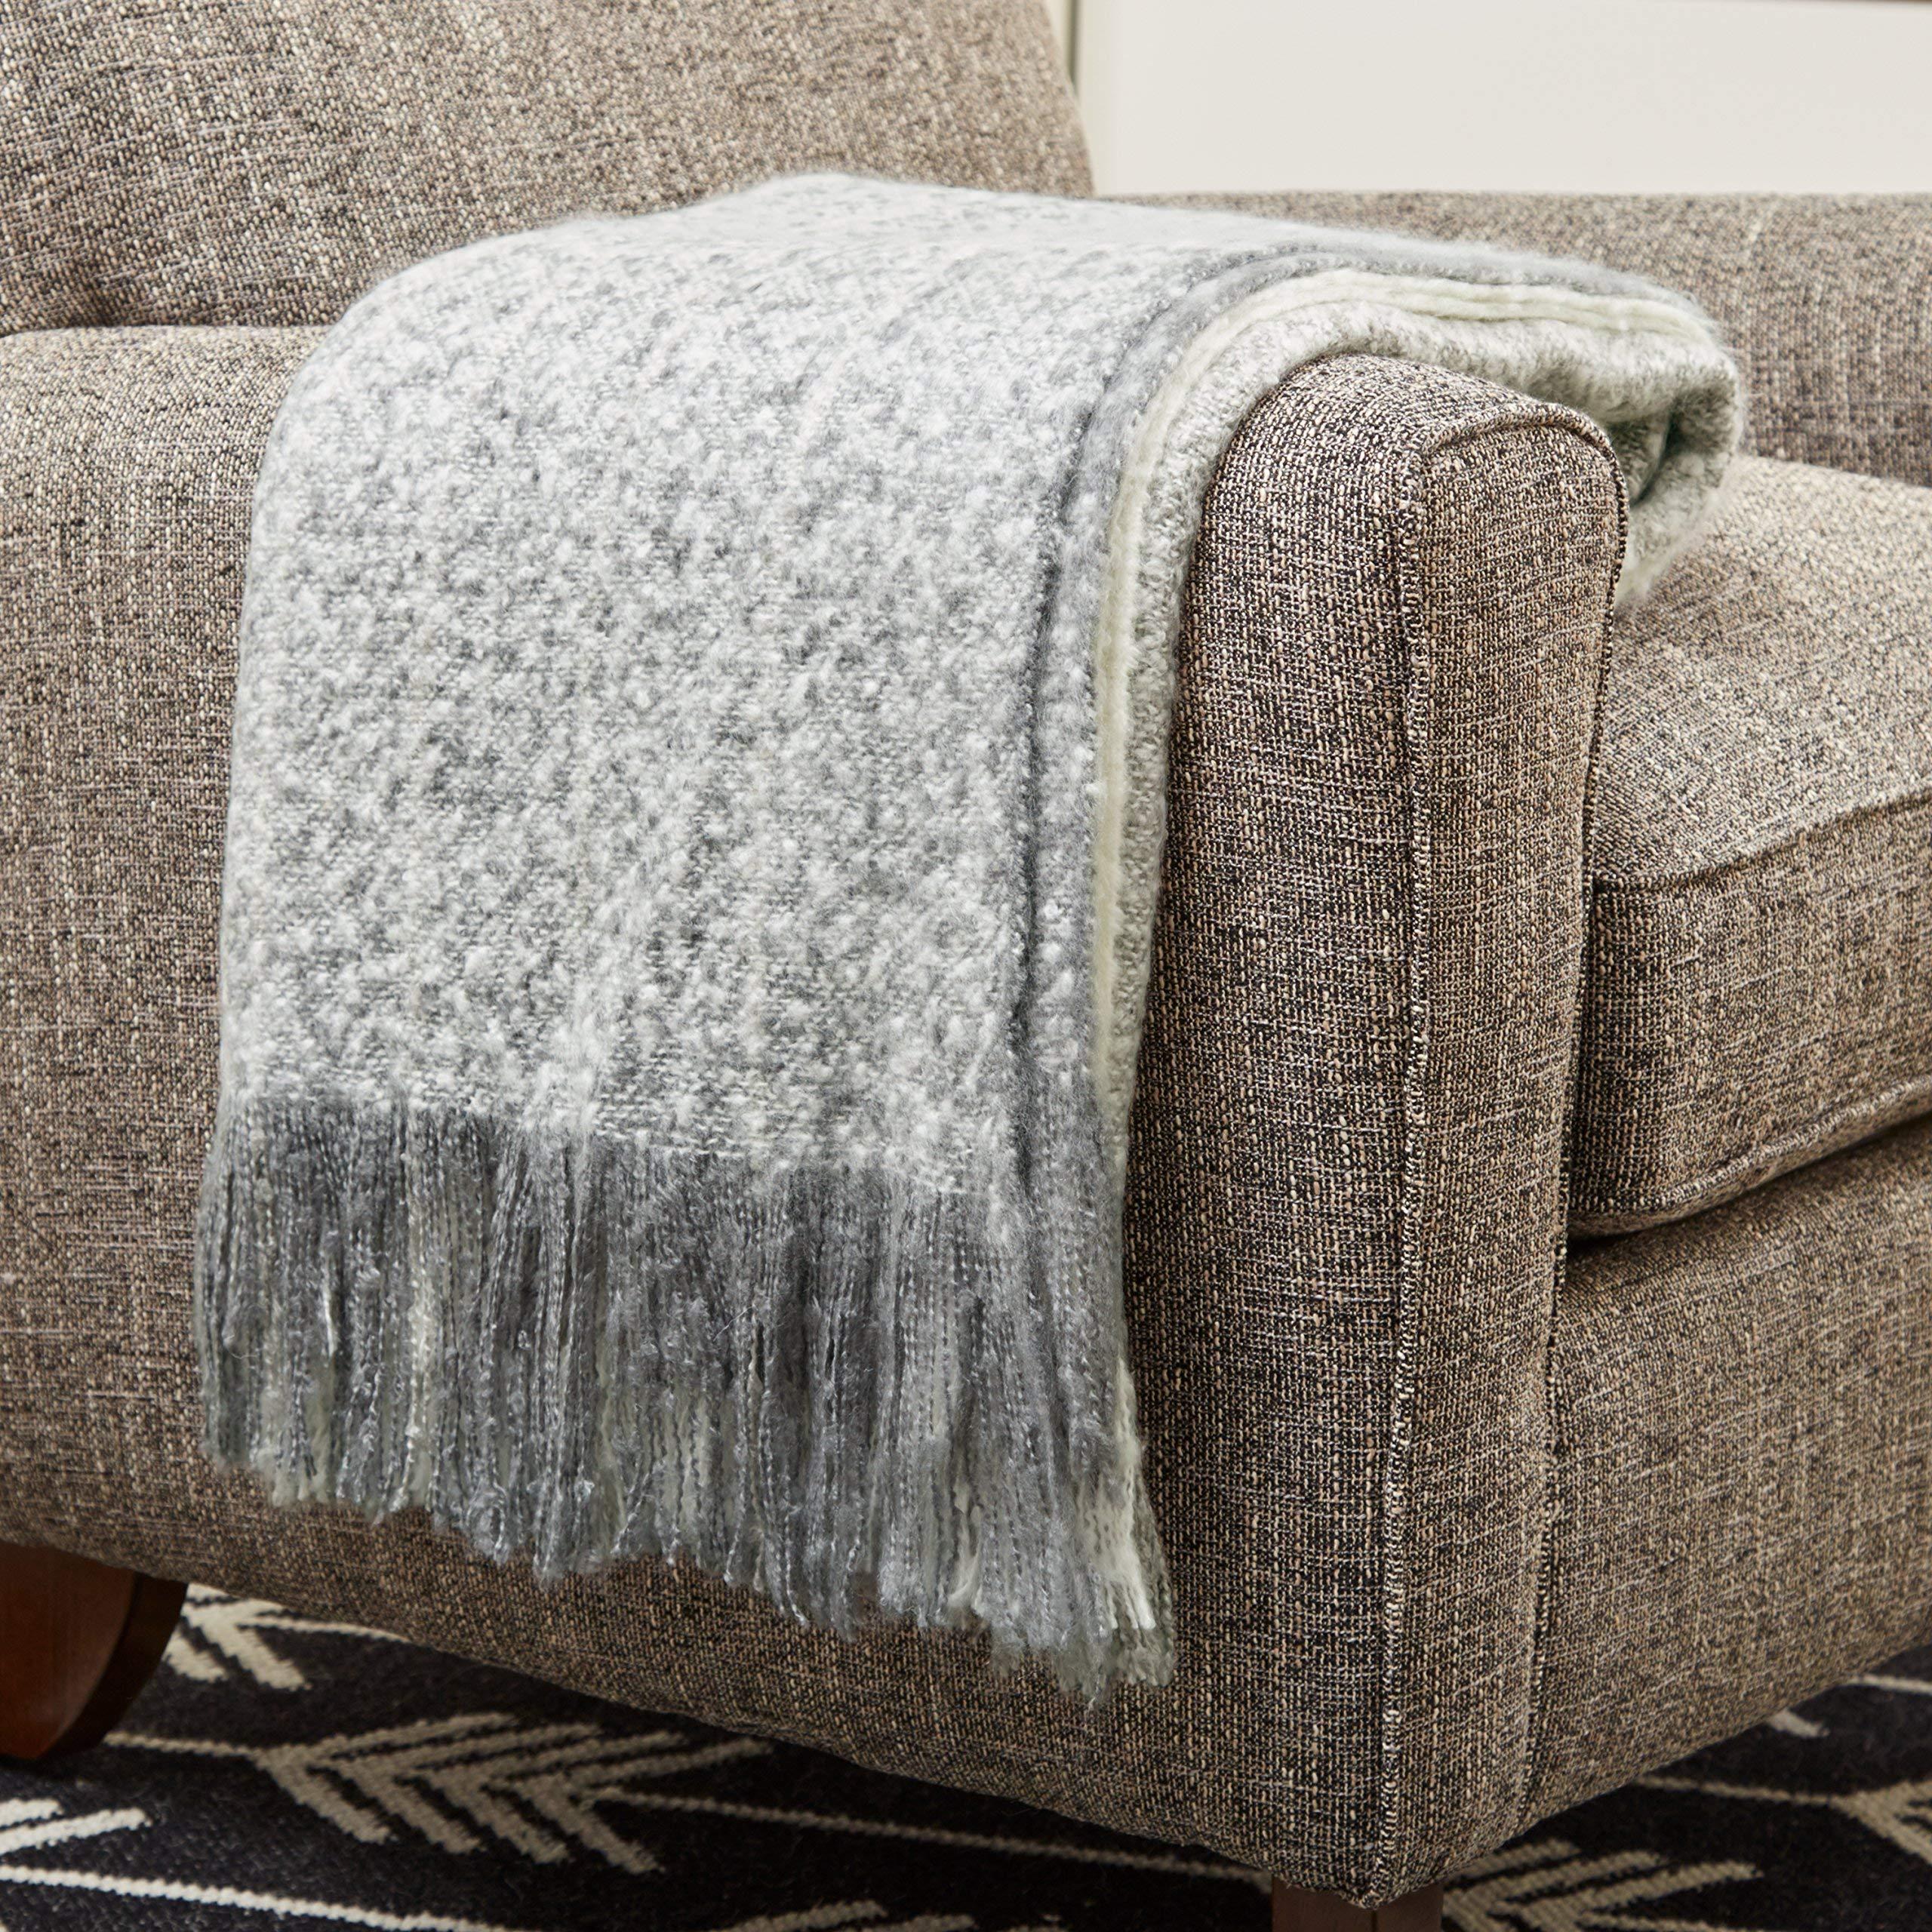 Rivet Super Soft Oversized Ombre Stripe Brushed Weave Throw Blanket, 60'' x 80'', Grey, White